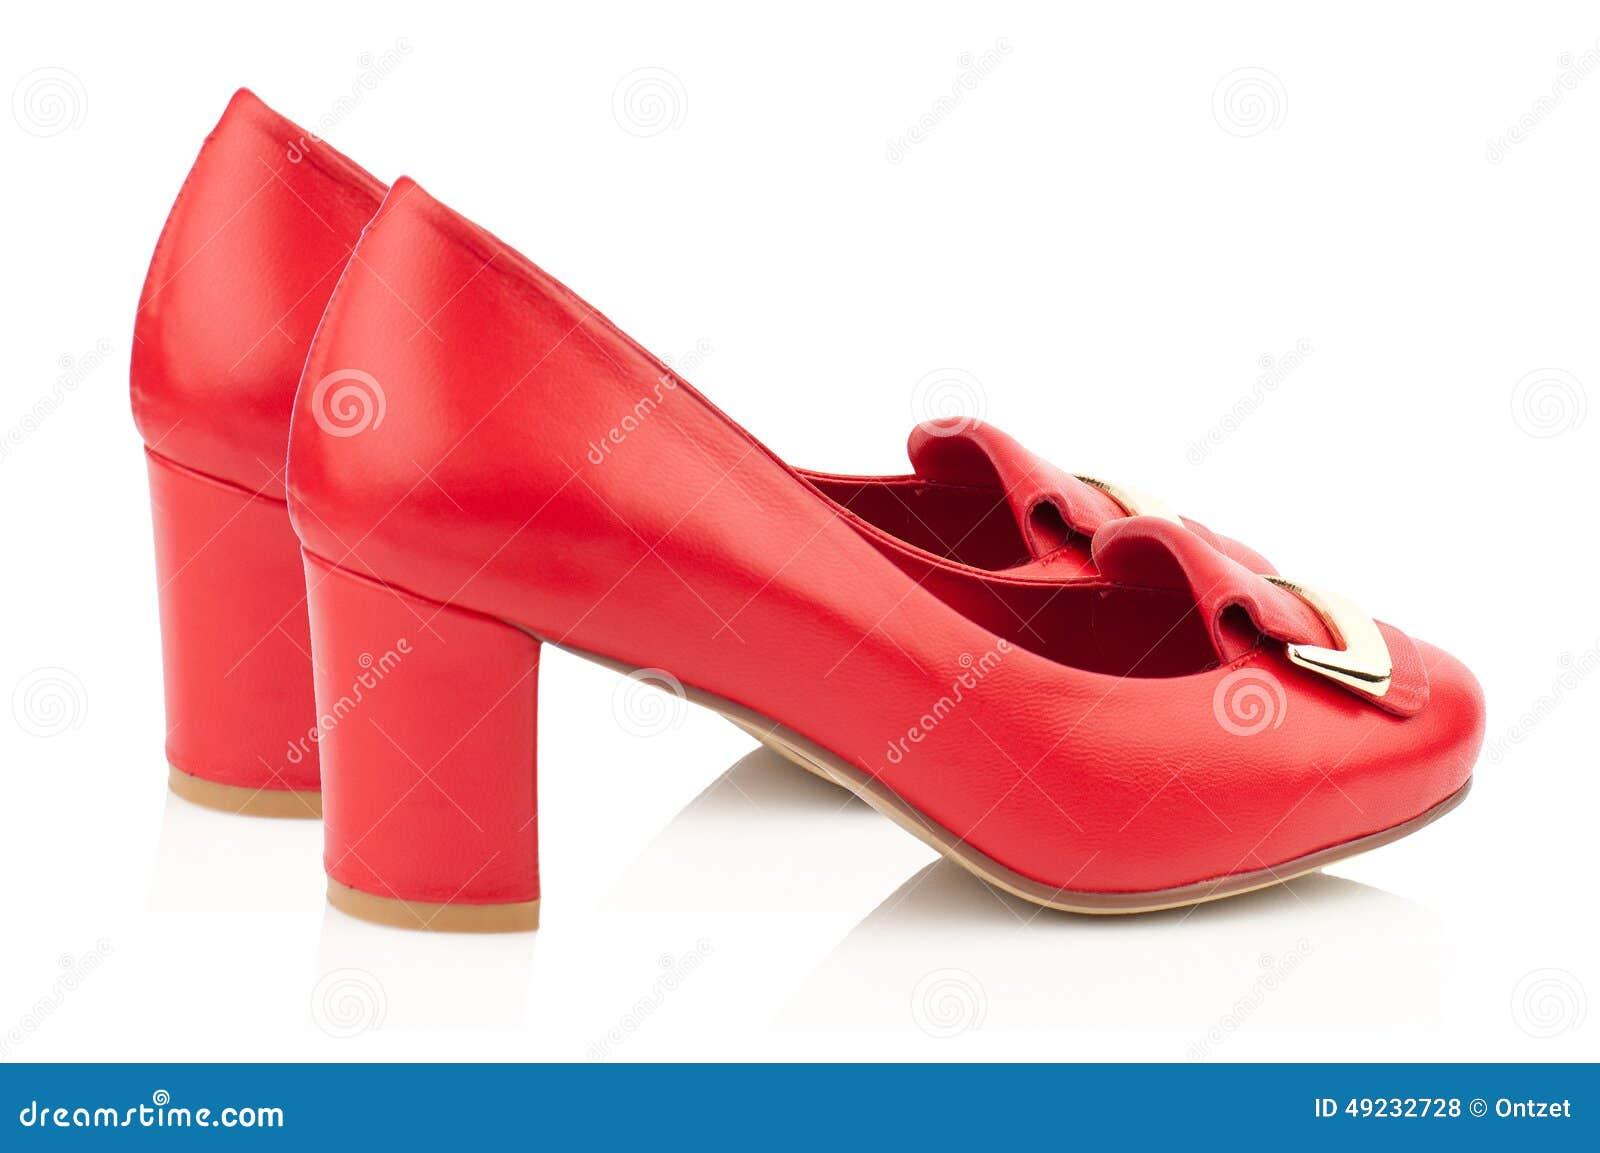 Heels shoes for women. Women shoes online